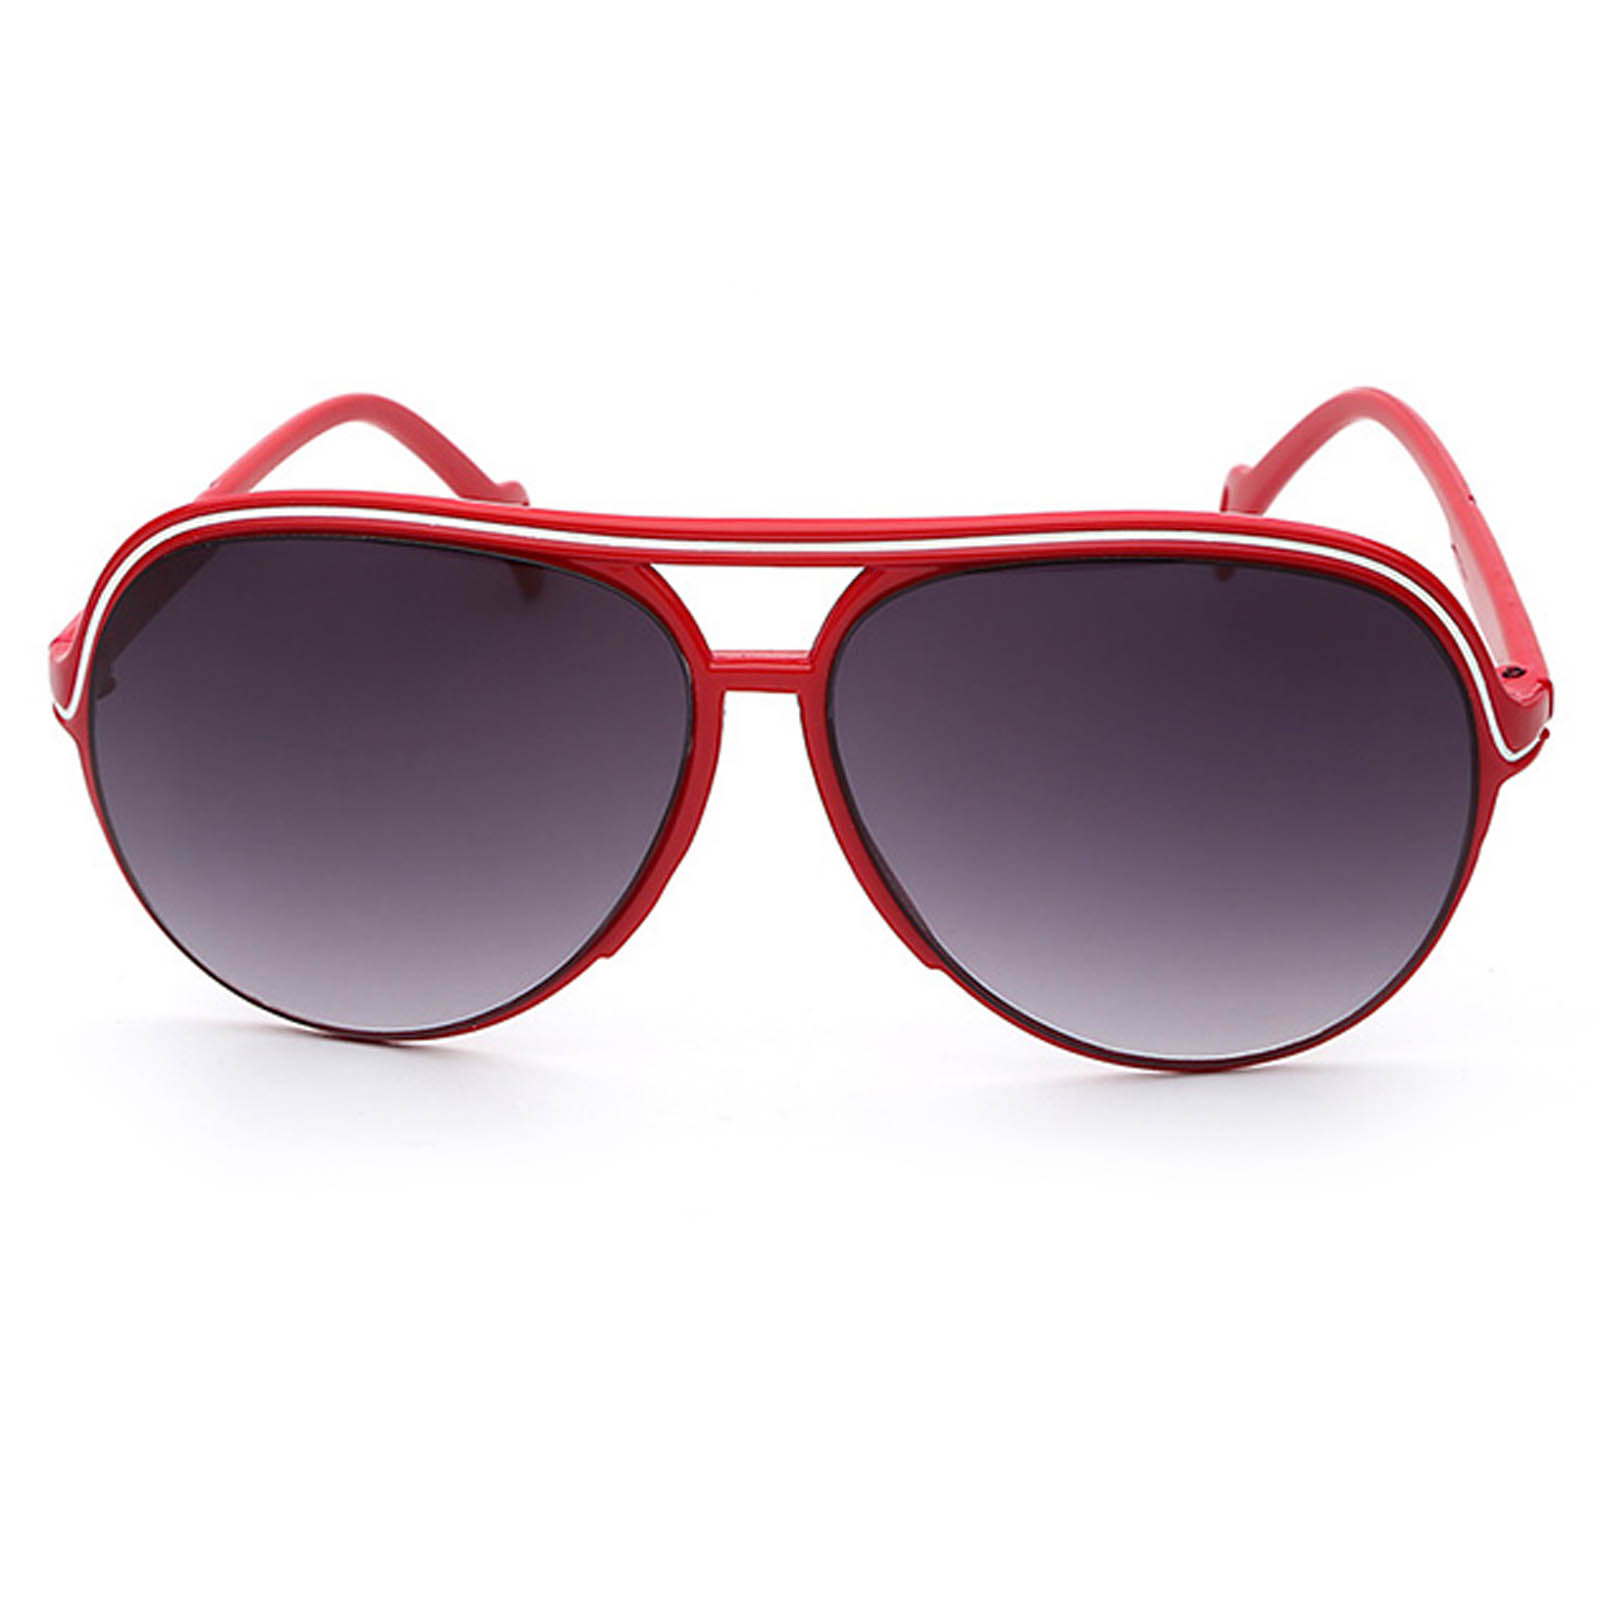 753aa59adac ... OWL ® 047 C3 Aviator Eyewear Sunglasses Women s Men s Plastic Red Frame  Smoke Lens One Pair ...